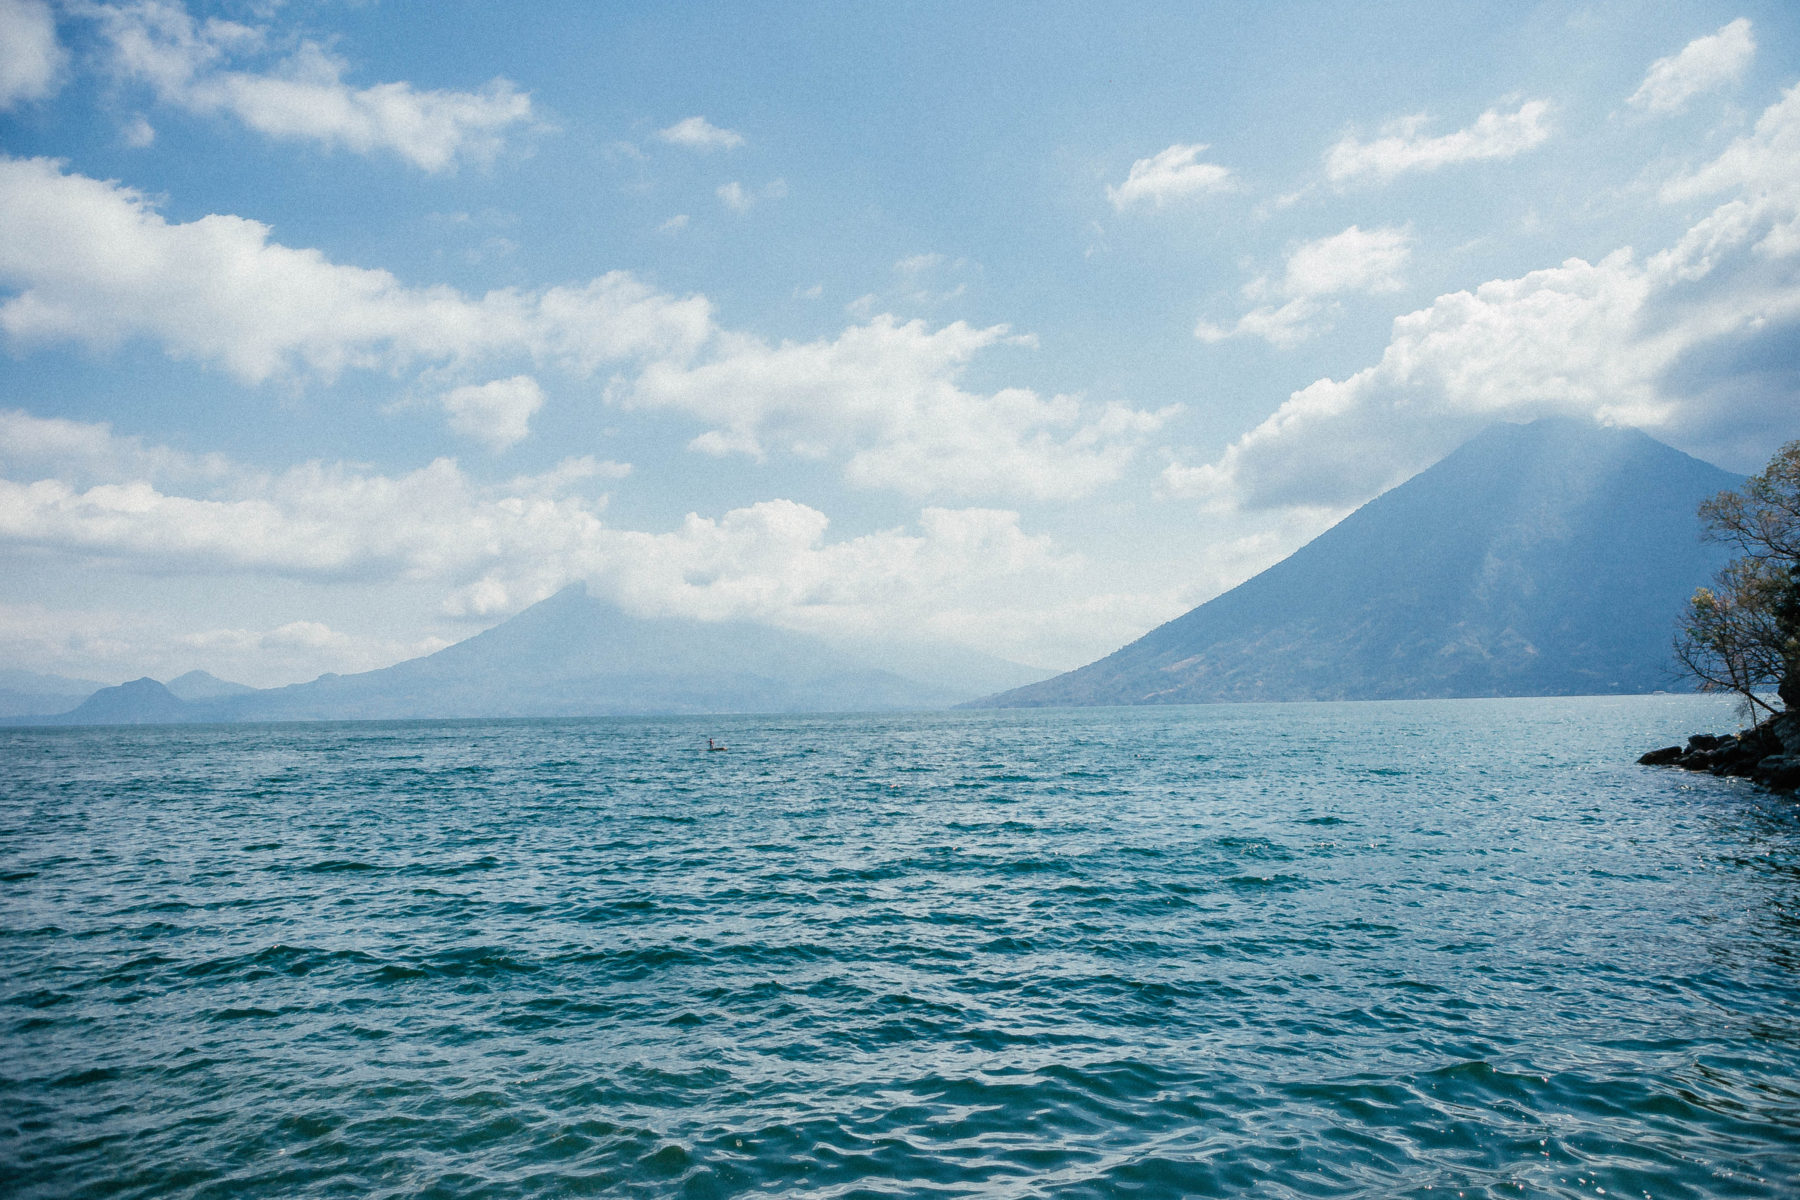 guatemala lake atitlan lago central america most beautiful lake in the world volcanoes sky on fire sunset blue